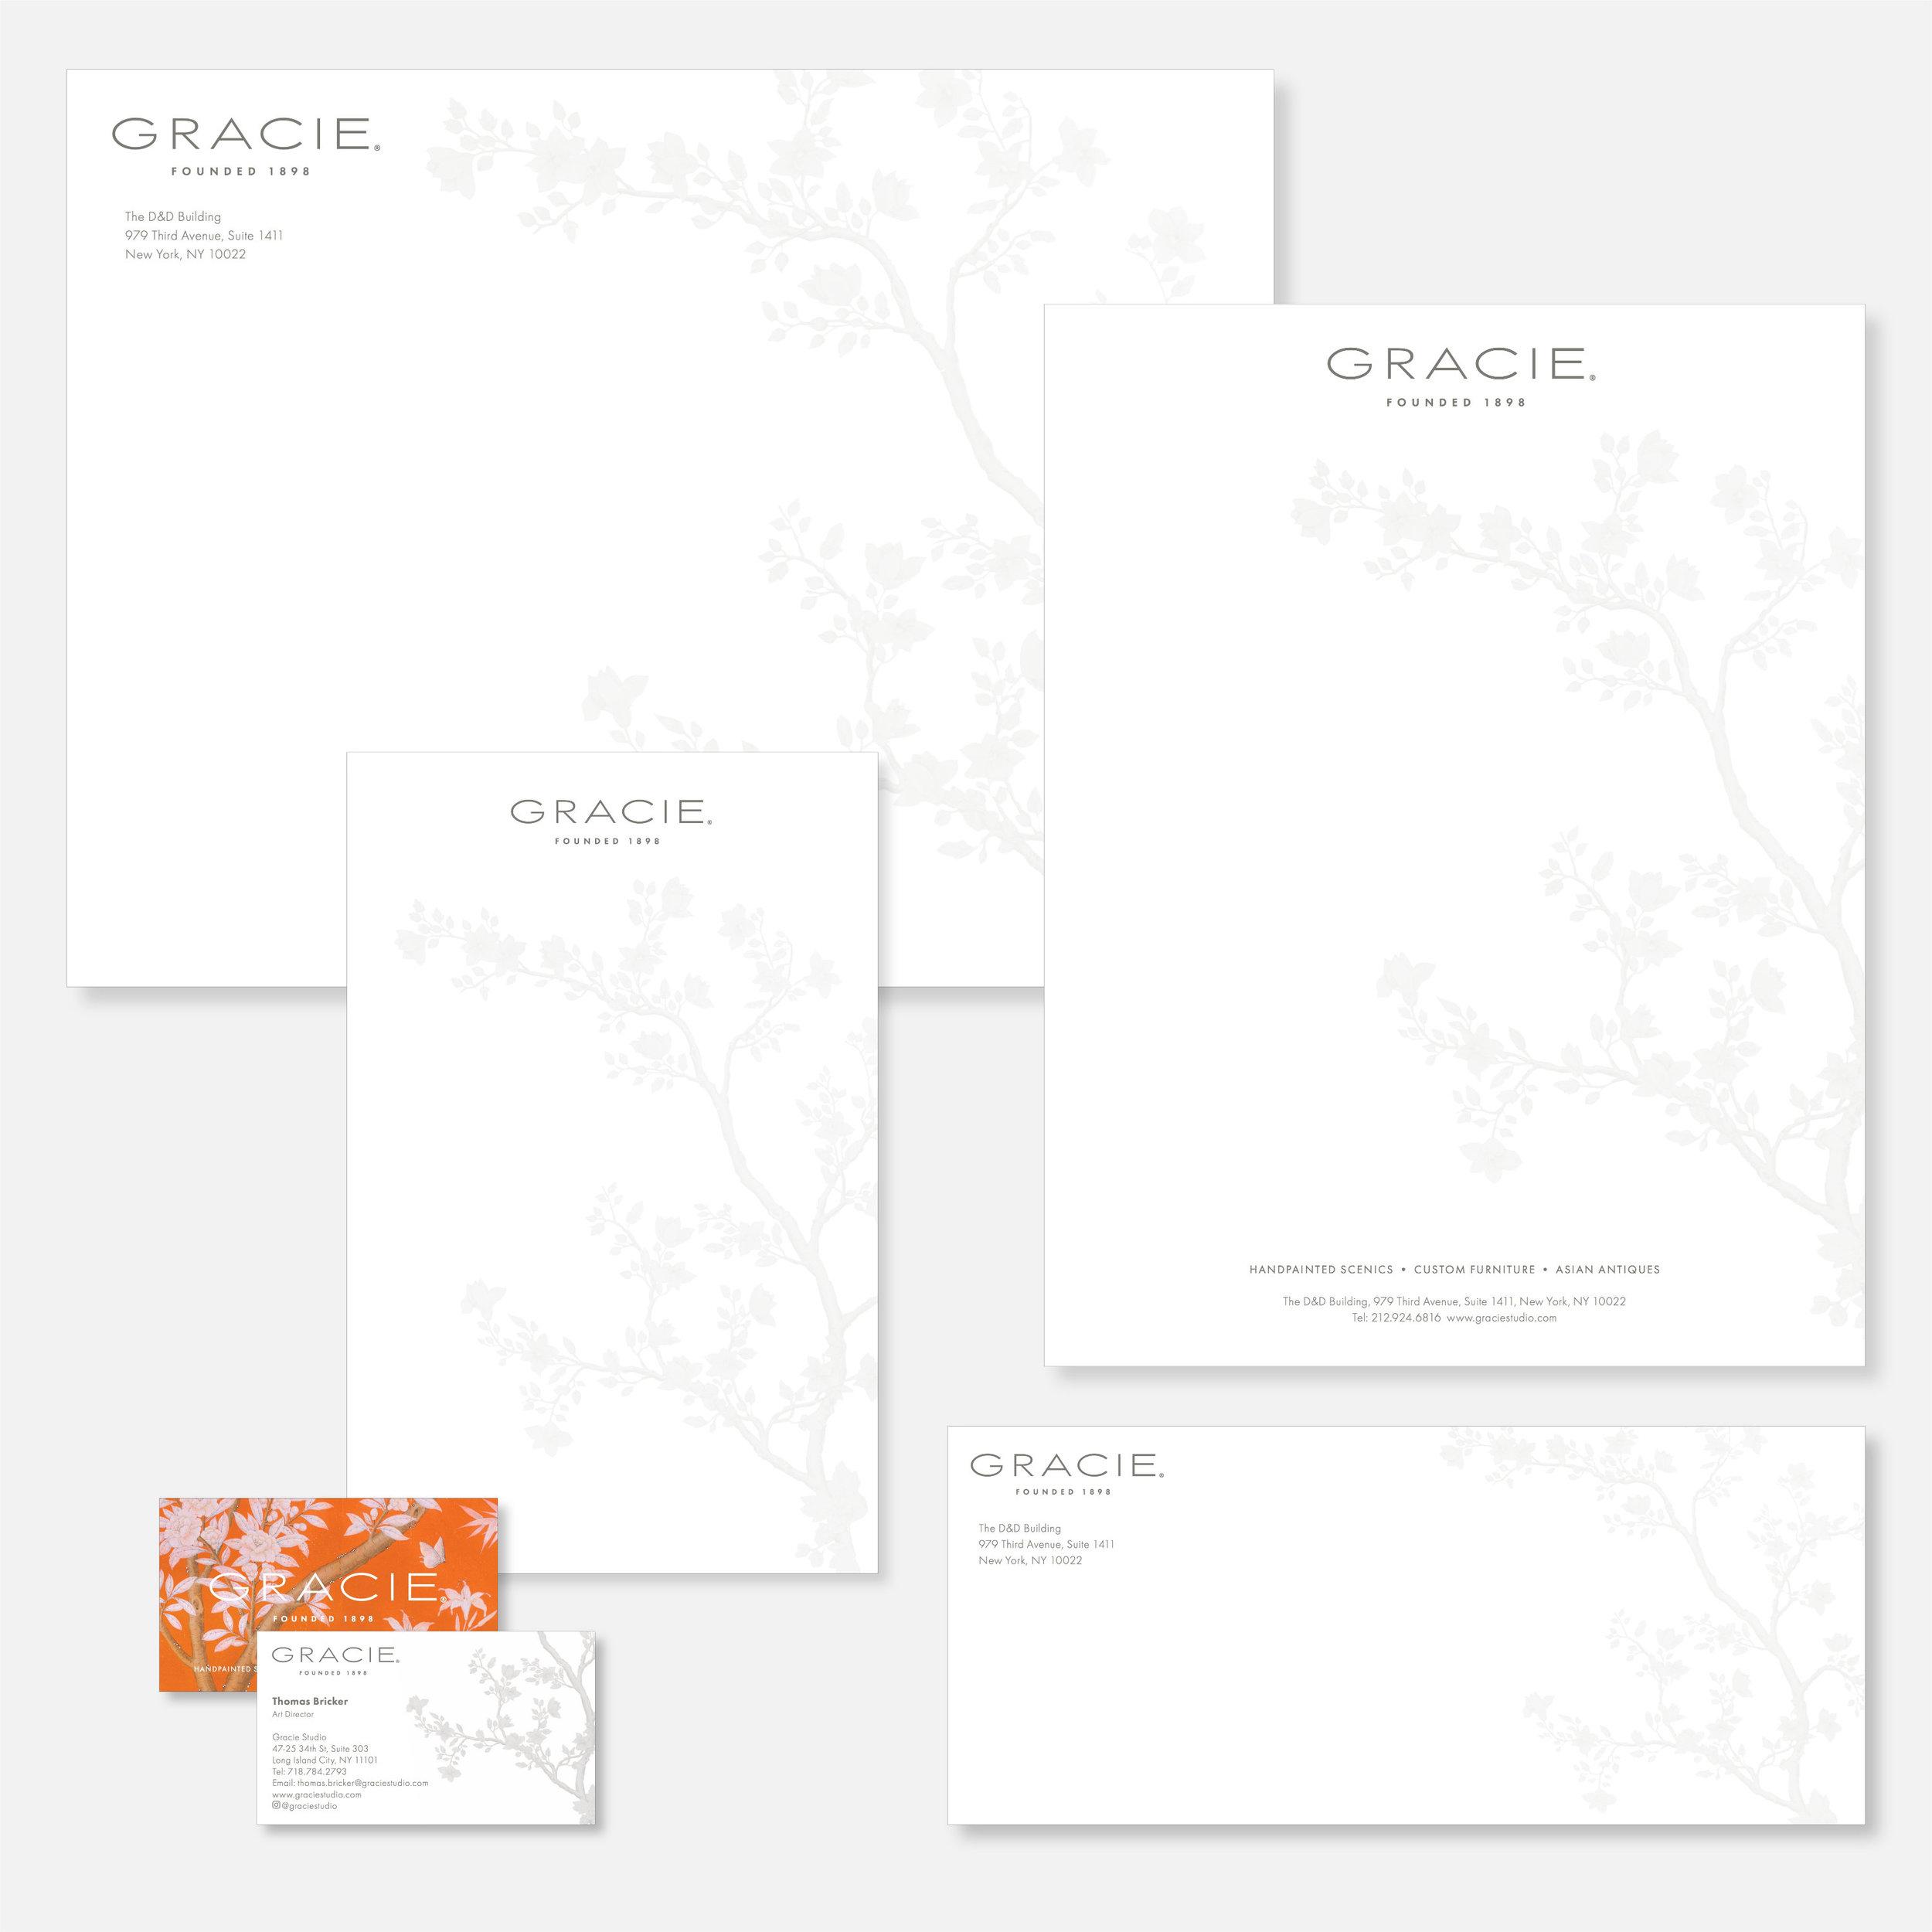 Gracie Stationery Comps.jpg